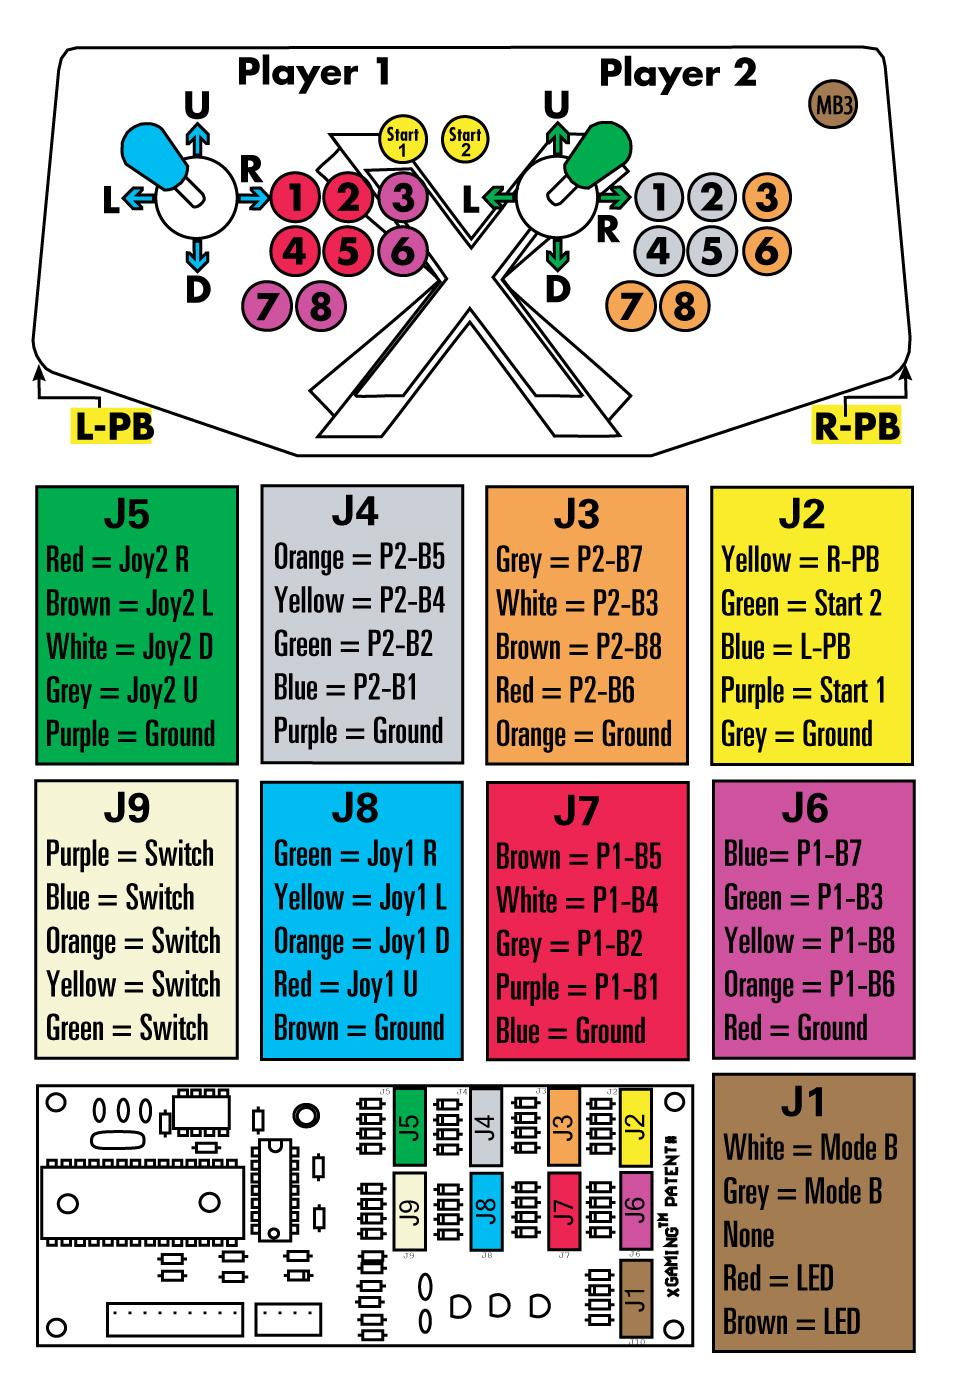 jamma harness wiring chart www pelletgrillpart com \u2022diagram cable harness file ck71376 rh diagram hansafanprojekt de jamma harness wiring diagram jamma wiring